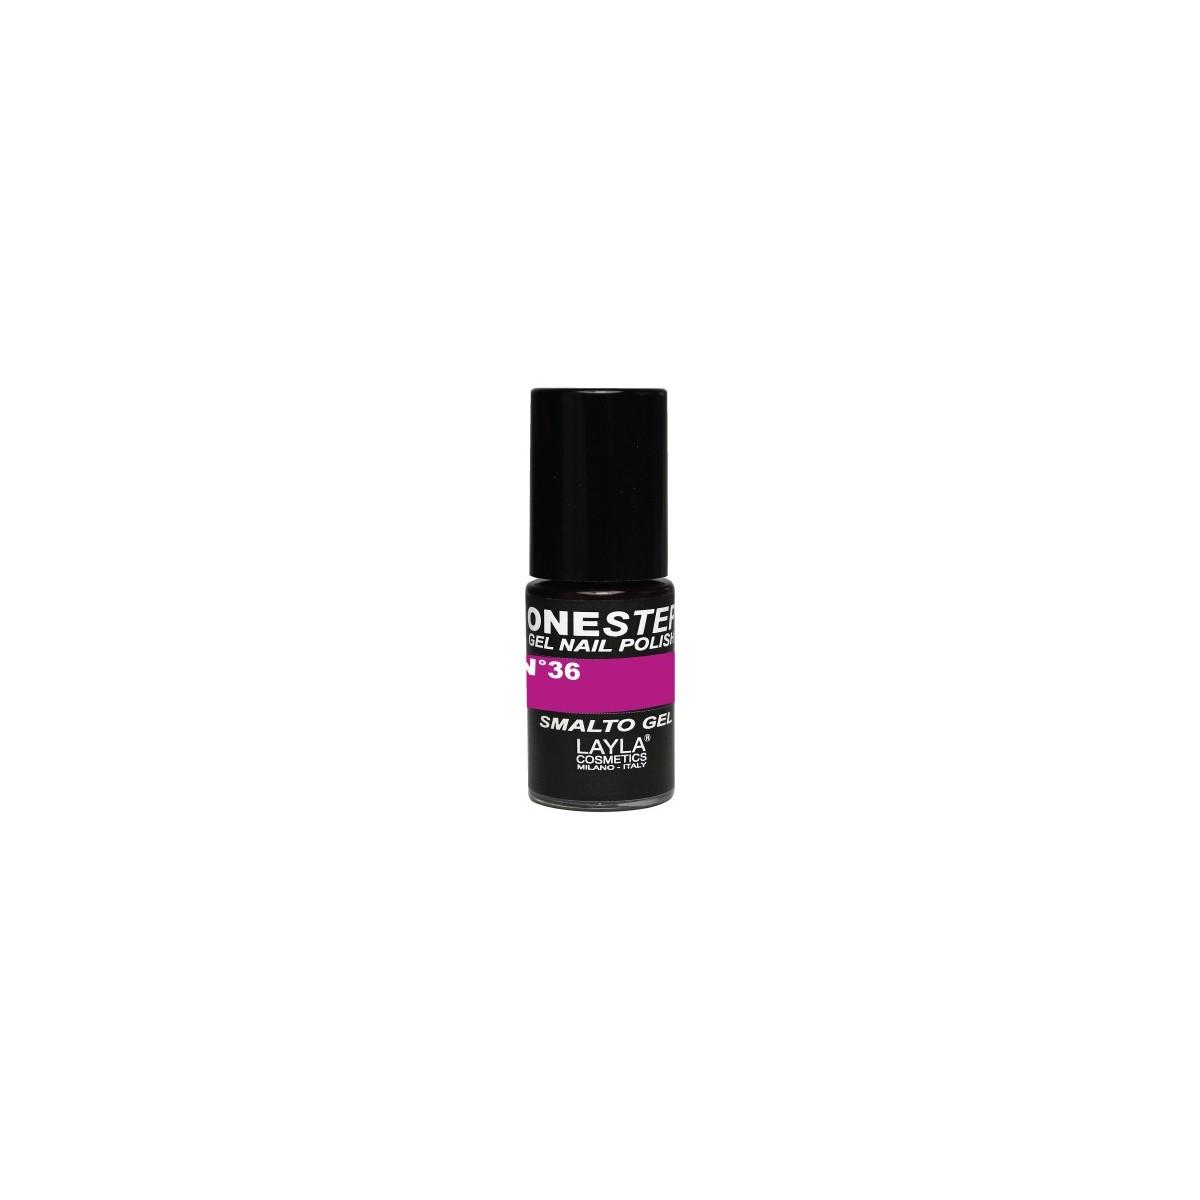 Vernis à ongles Tati Love Violet Fluo UV Gel One-step Layla